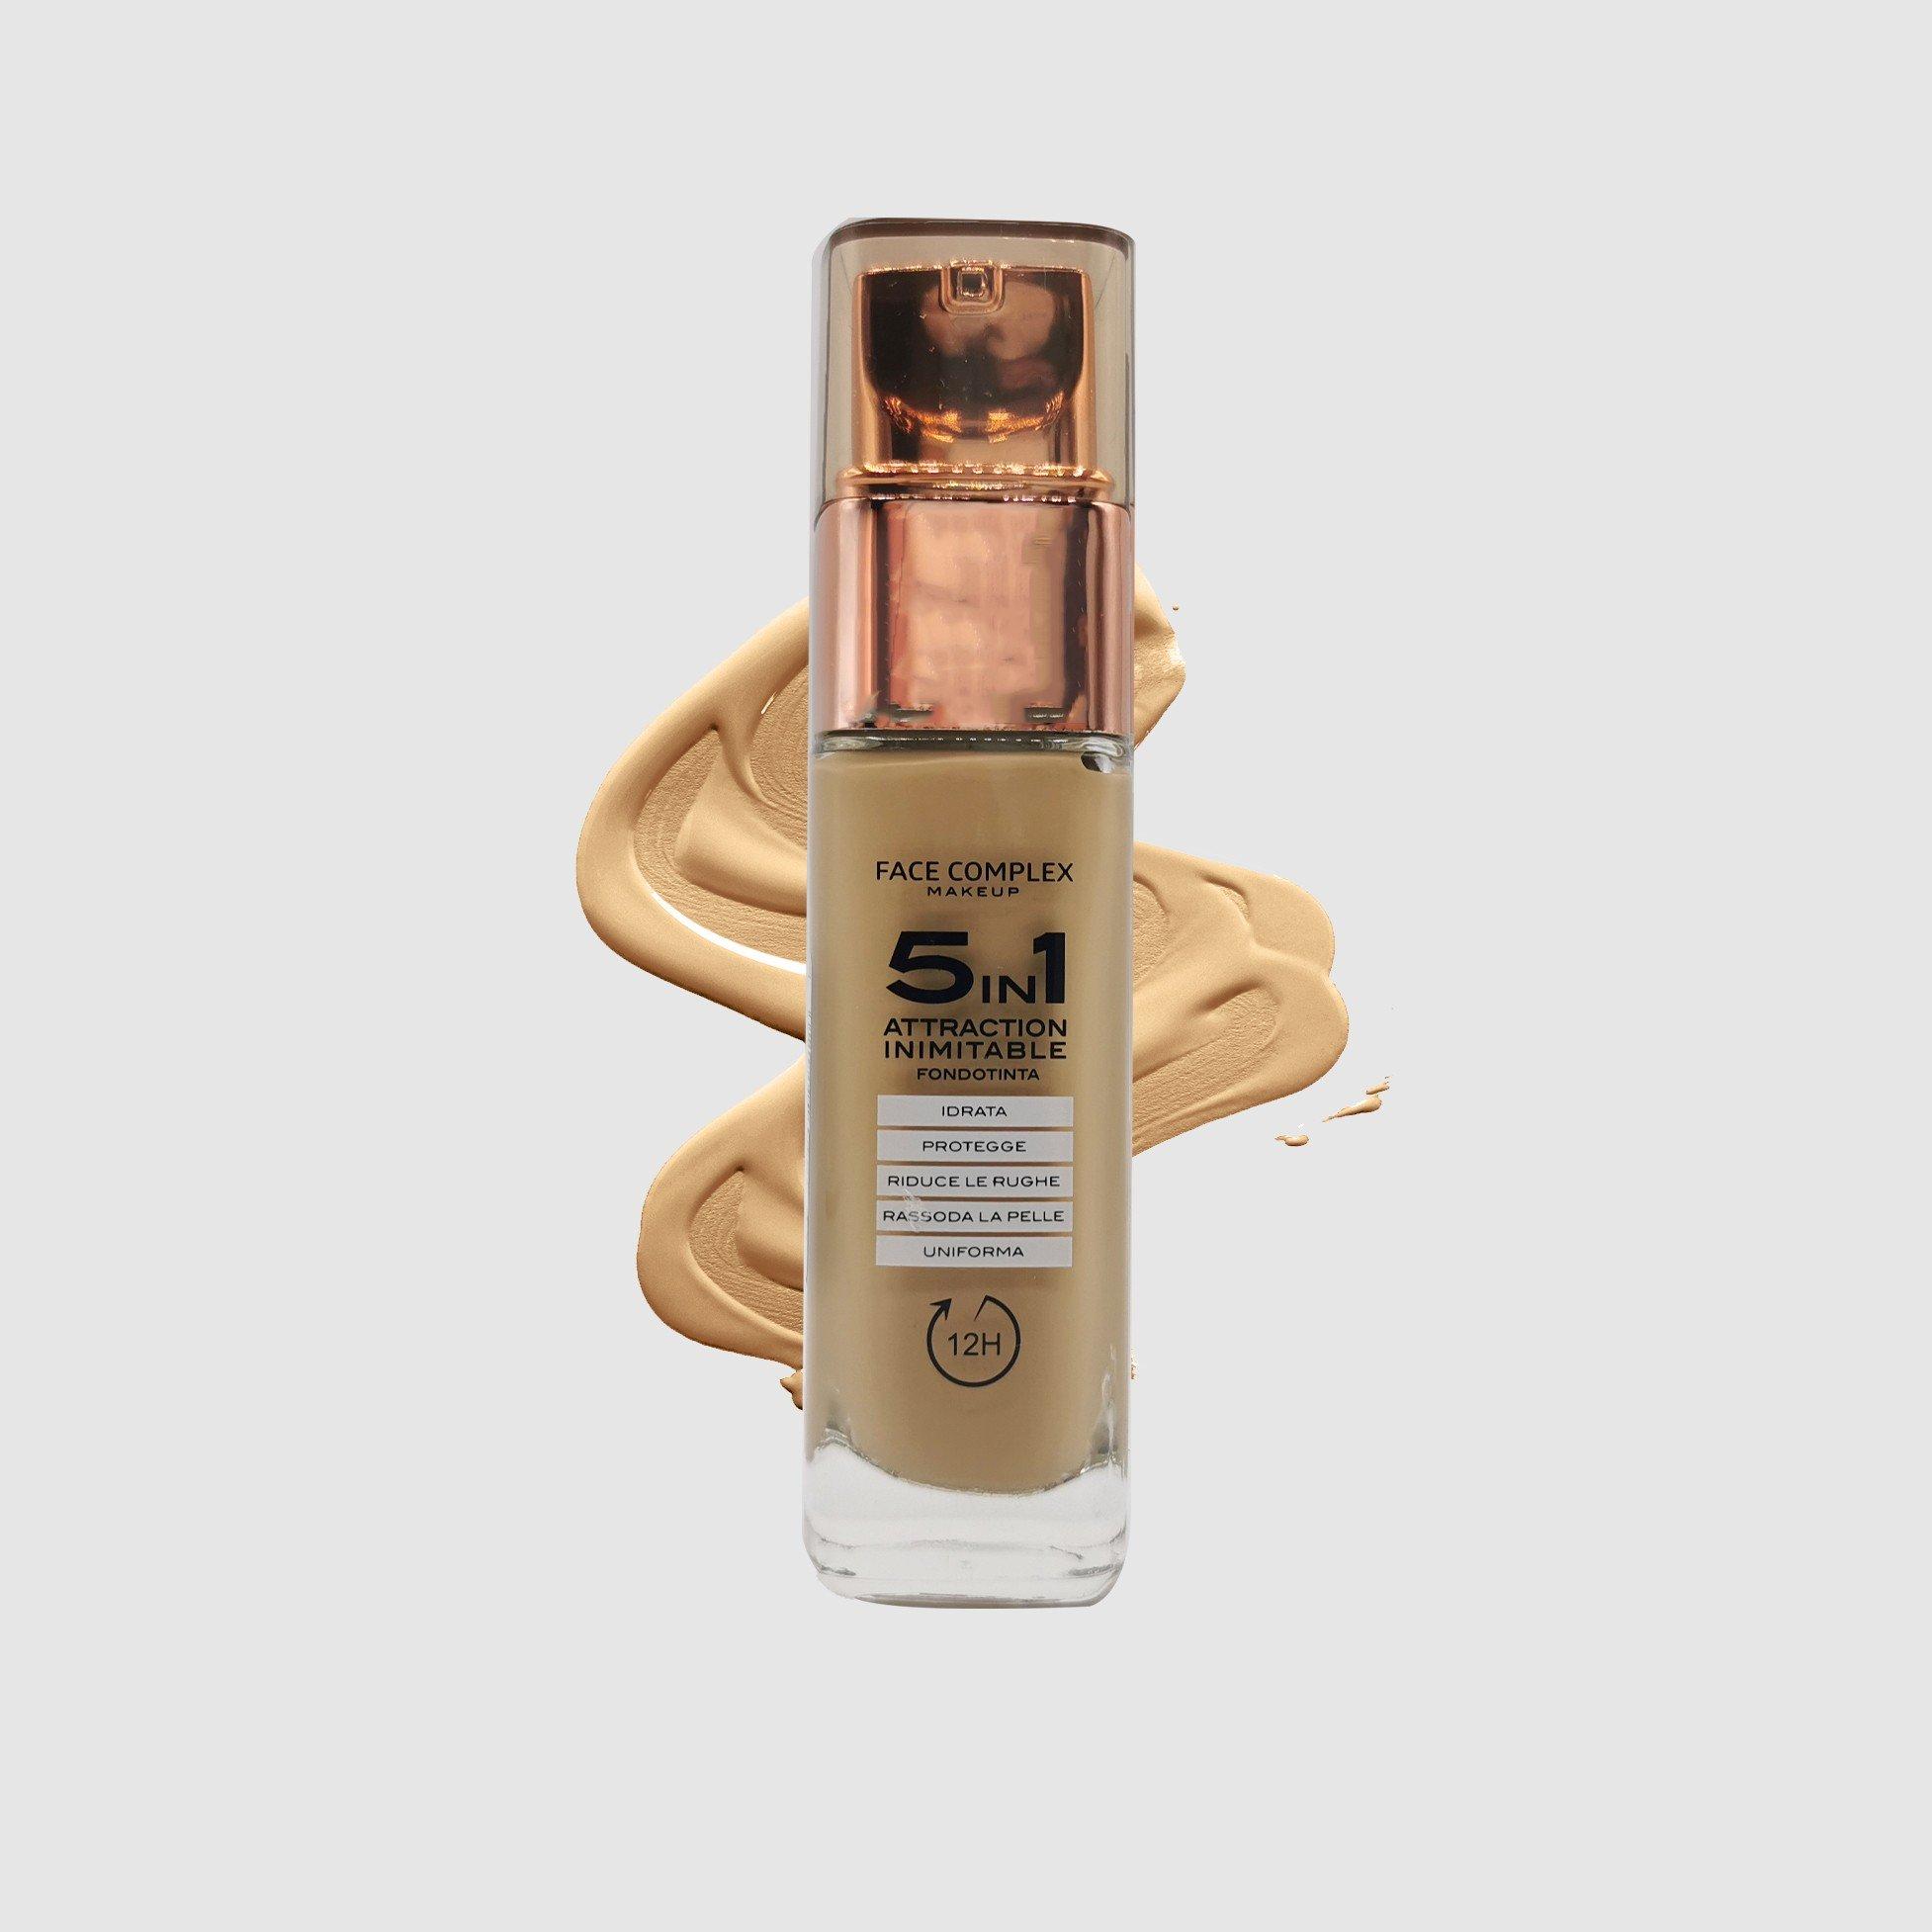 Fondotinta 5 in 1 attraction inimitable Face Complex Cosmetics